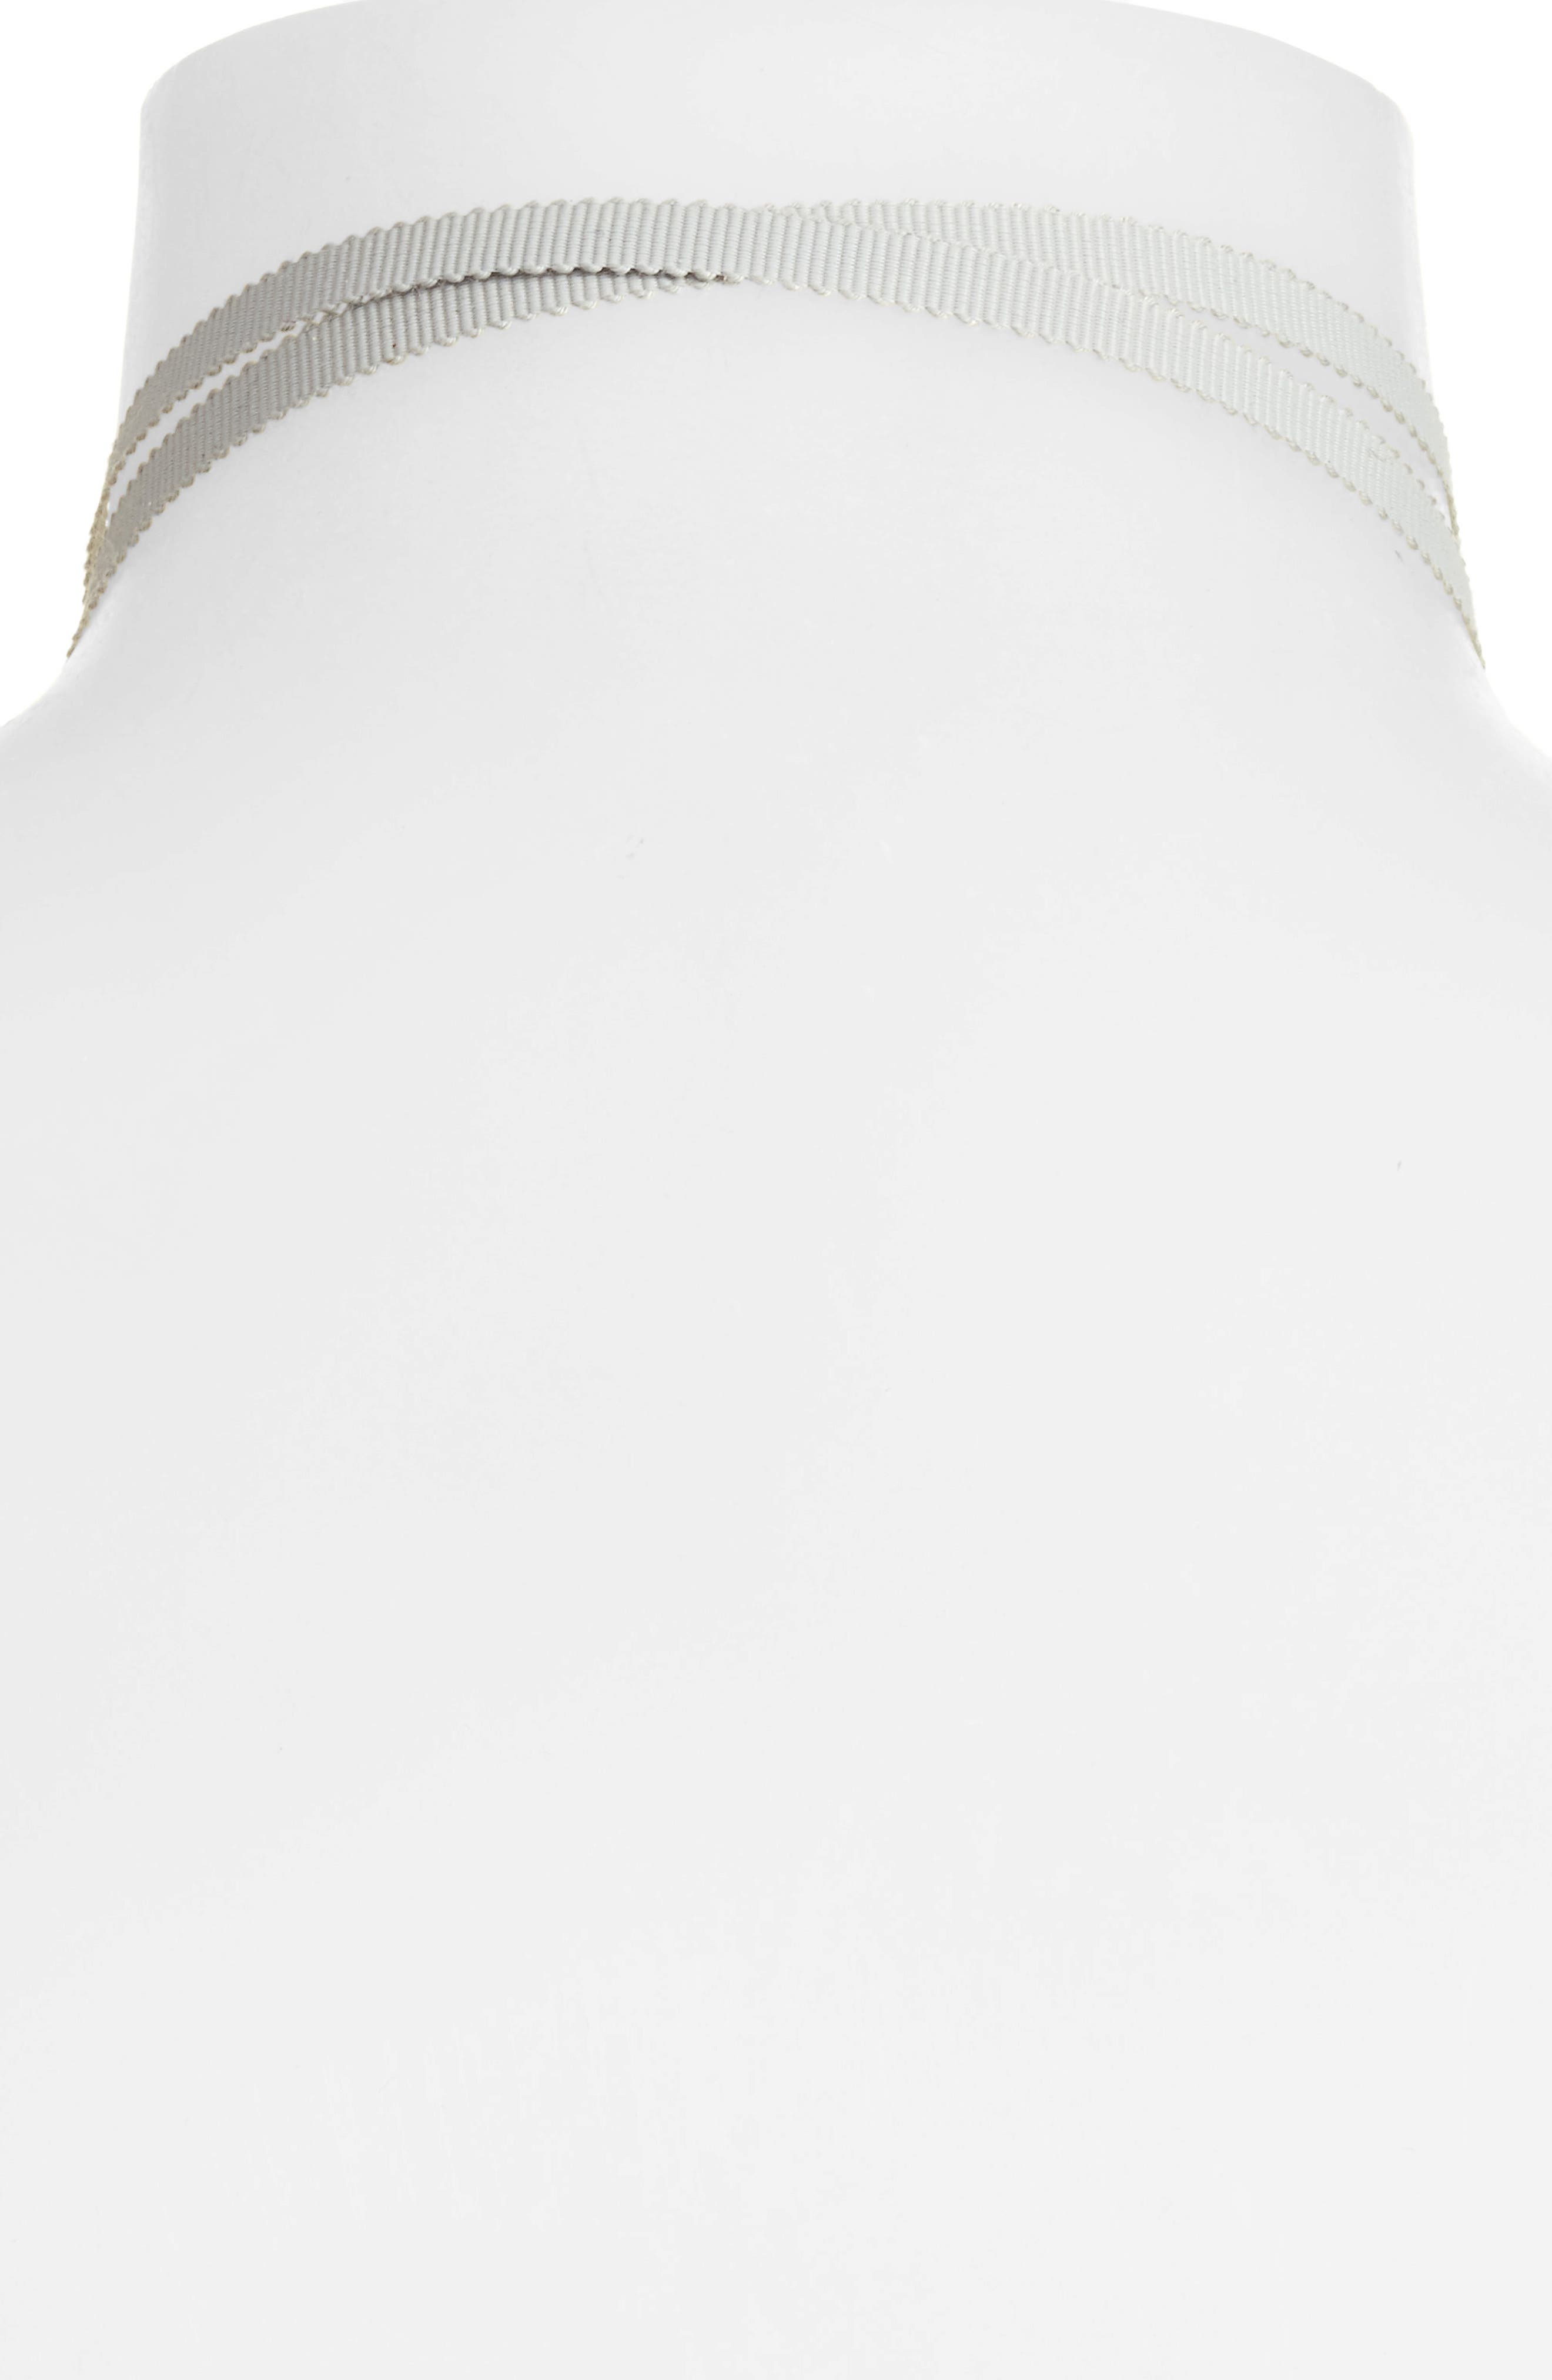 Tie Choker Necklace,                             Alternate thumbnail 4, color,